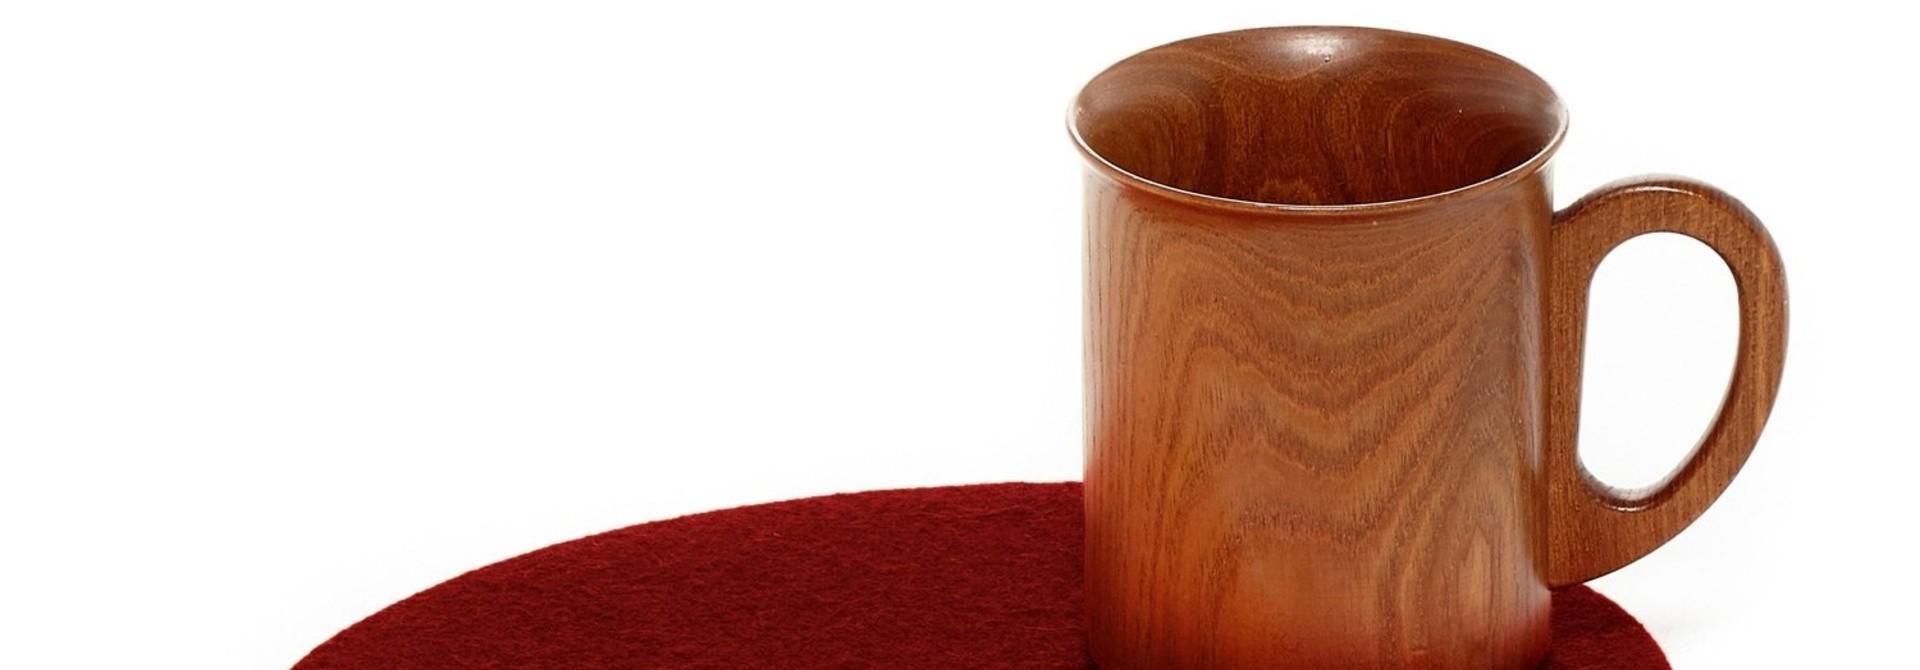 Felt Trivet Stone Medium - Rosewood